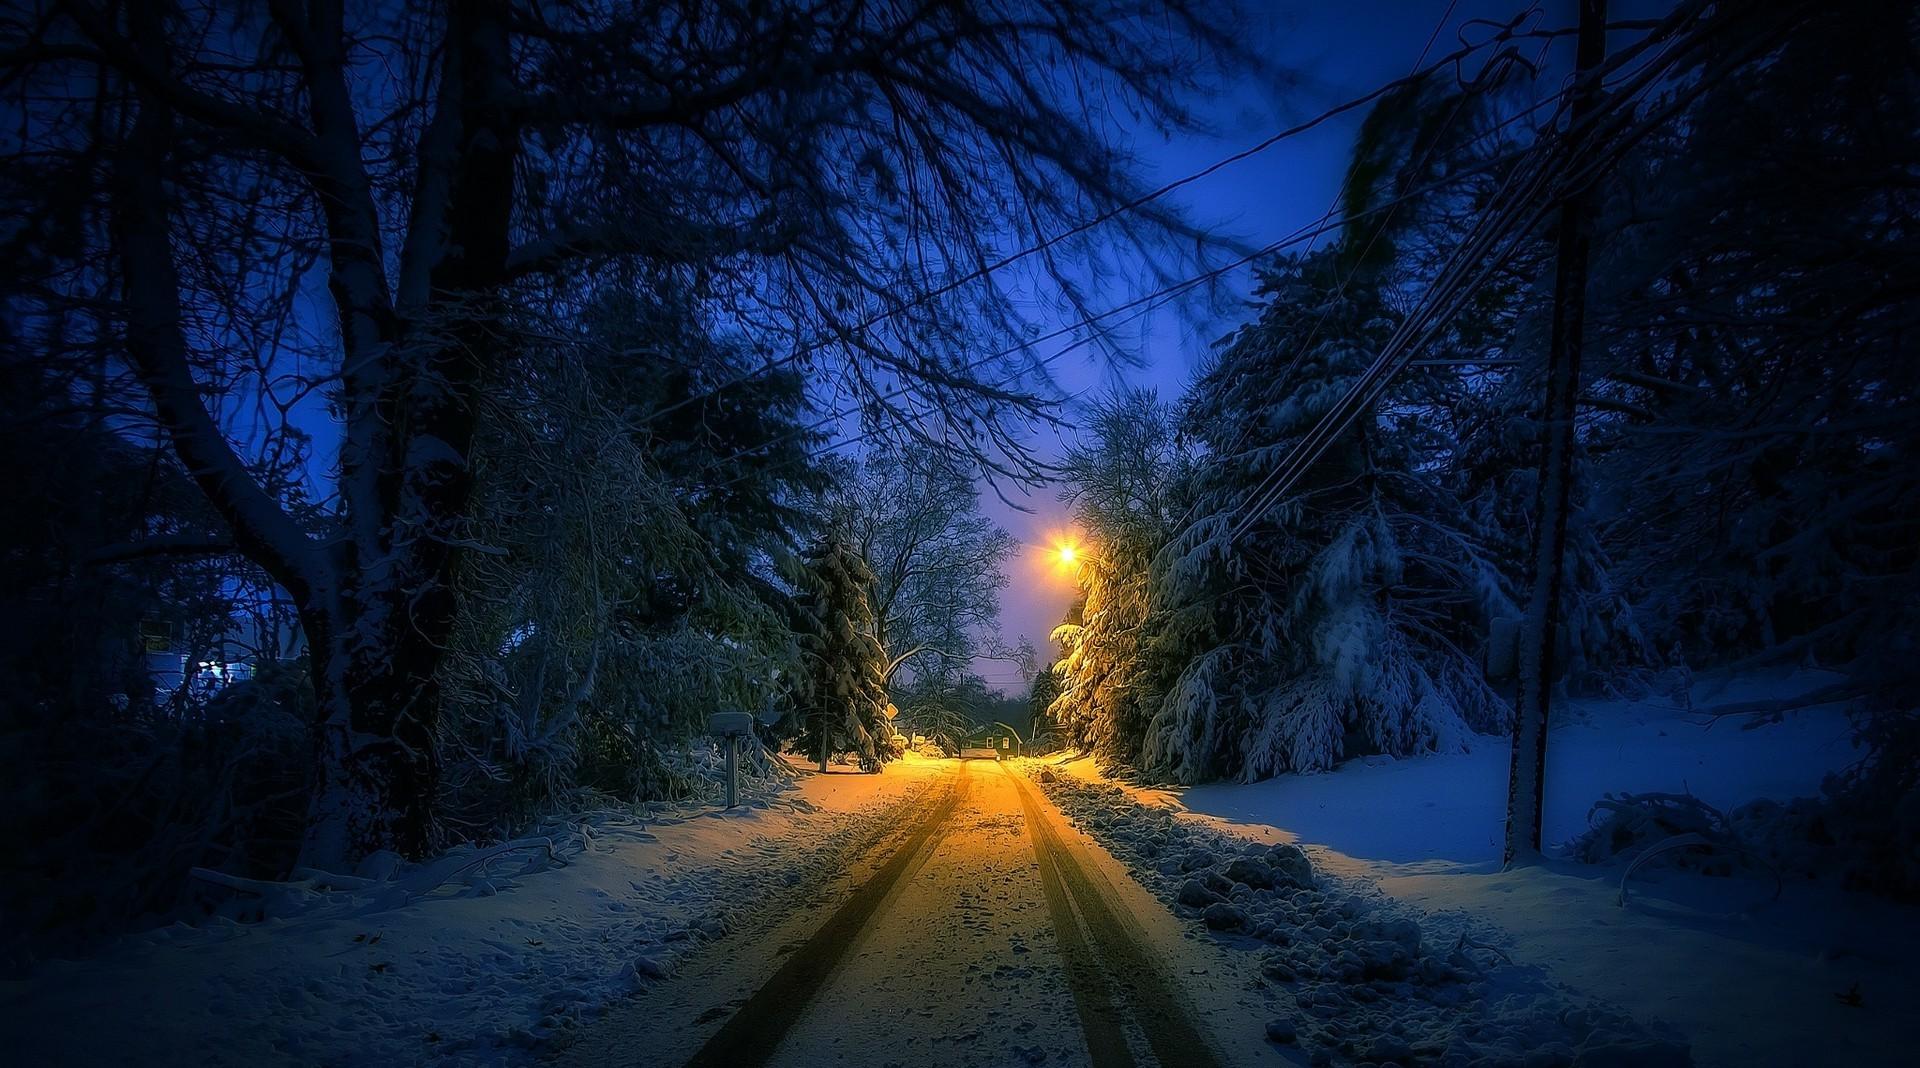 ... Night, Nature, Urban, Snow, Winter, Branch, Lantern, Cold, Evening,  Morning, Moonlight, Atmosphere, Tracks, Midnight, Connecticut, Light, Tree,  Weather, ...